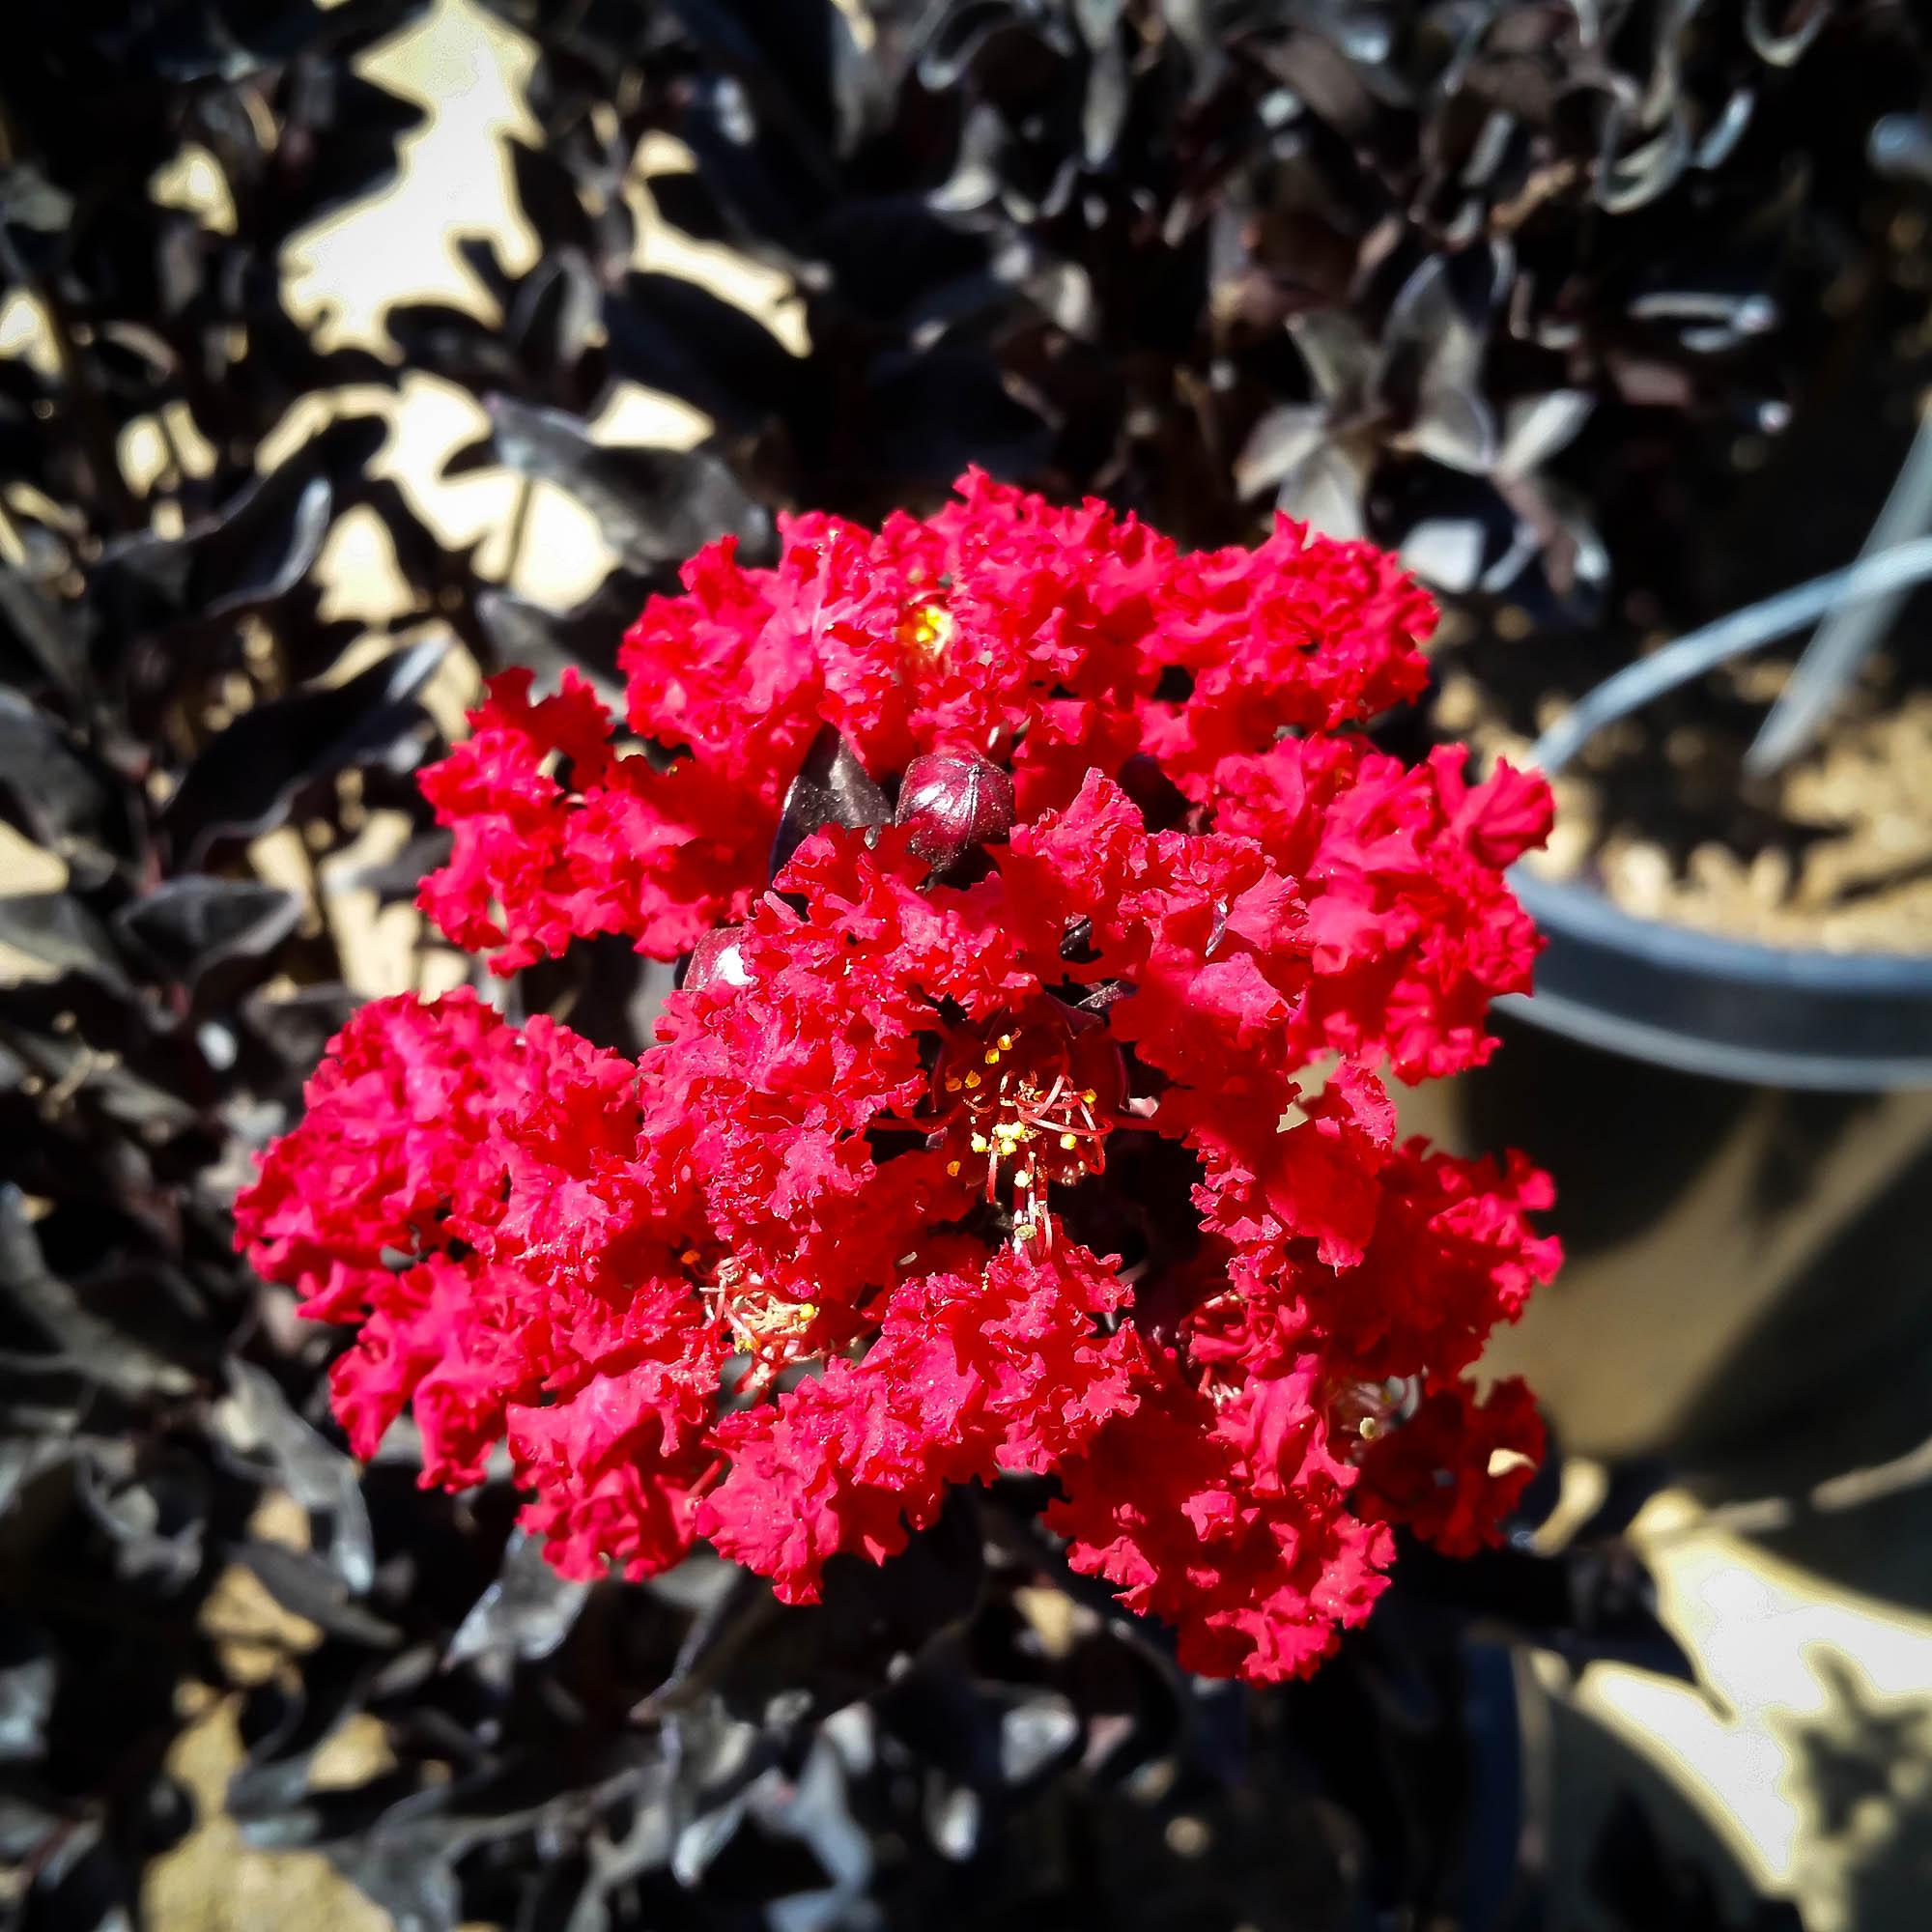 Buy Best Red Black Diamond Crape Myrtles Online | The Tree ...